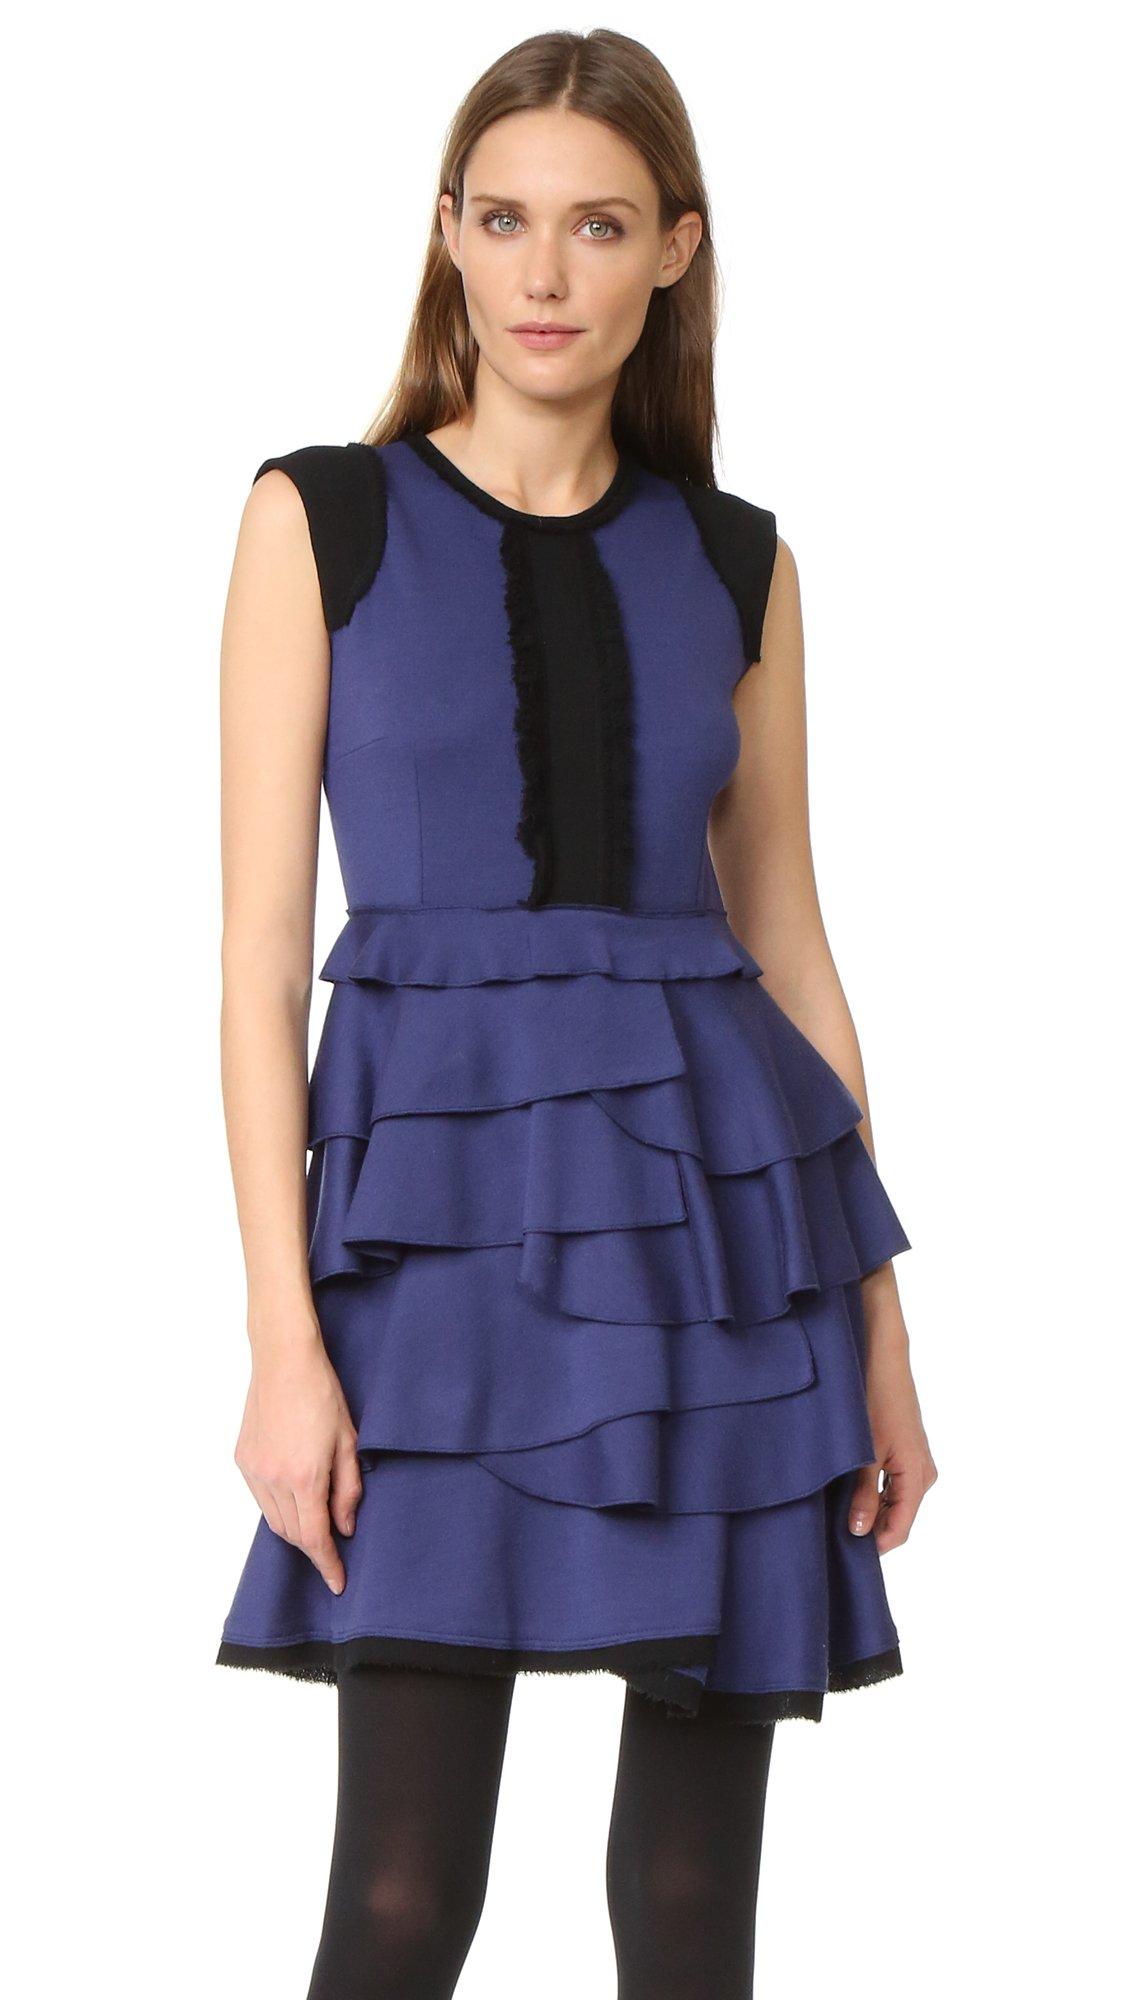 Amelia Toro Women's Sleeveless Ruffle Dress, Blue/Black, 8